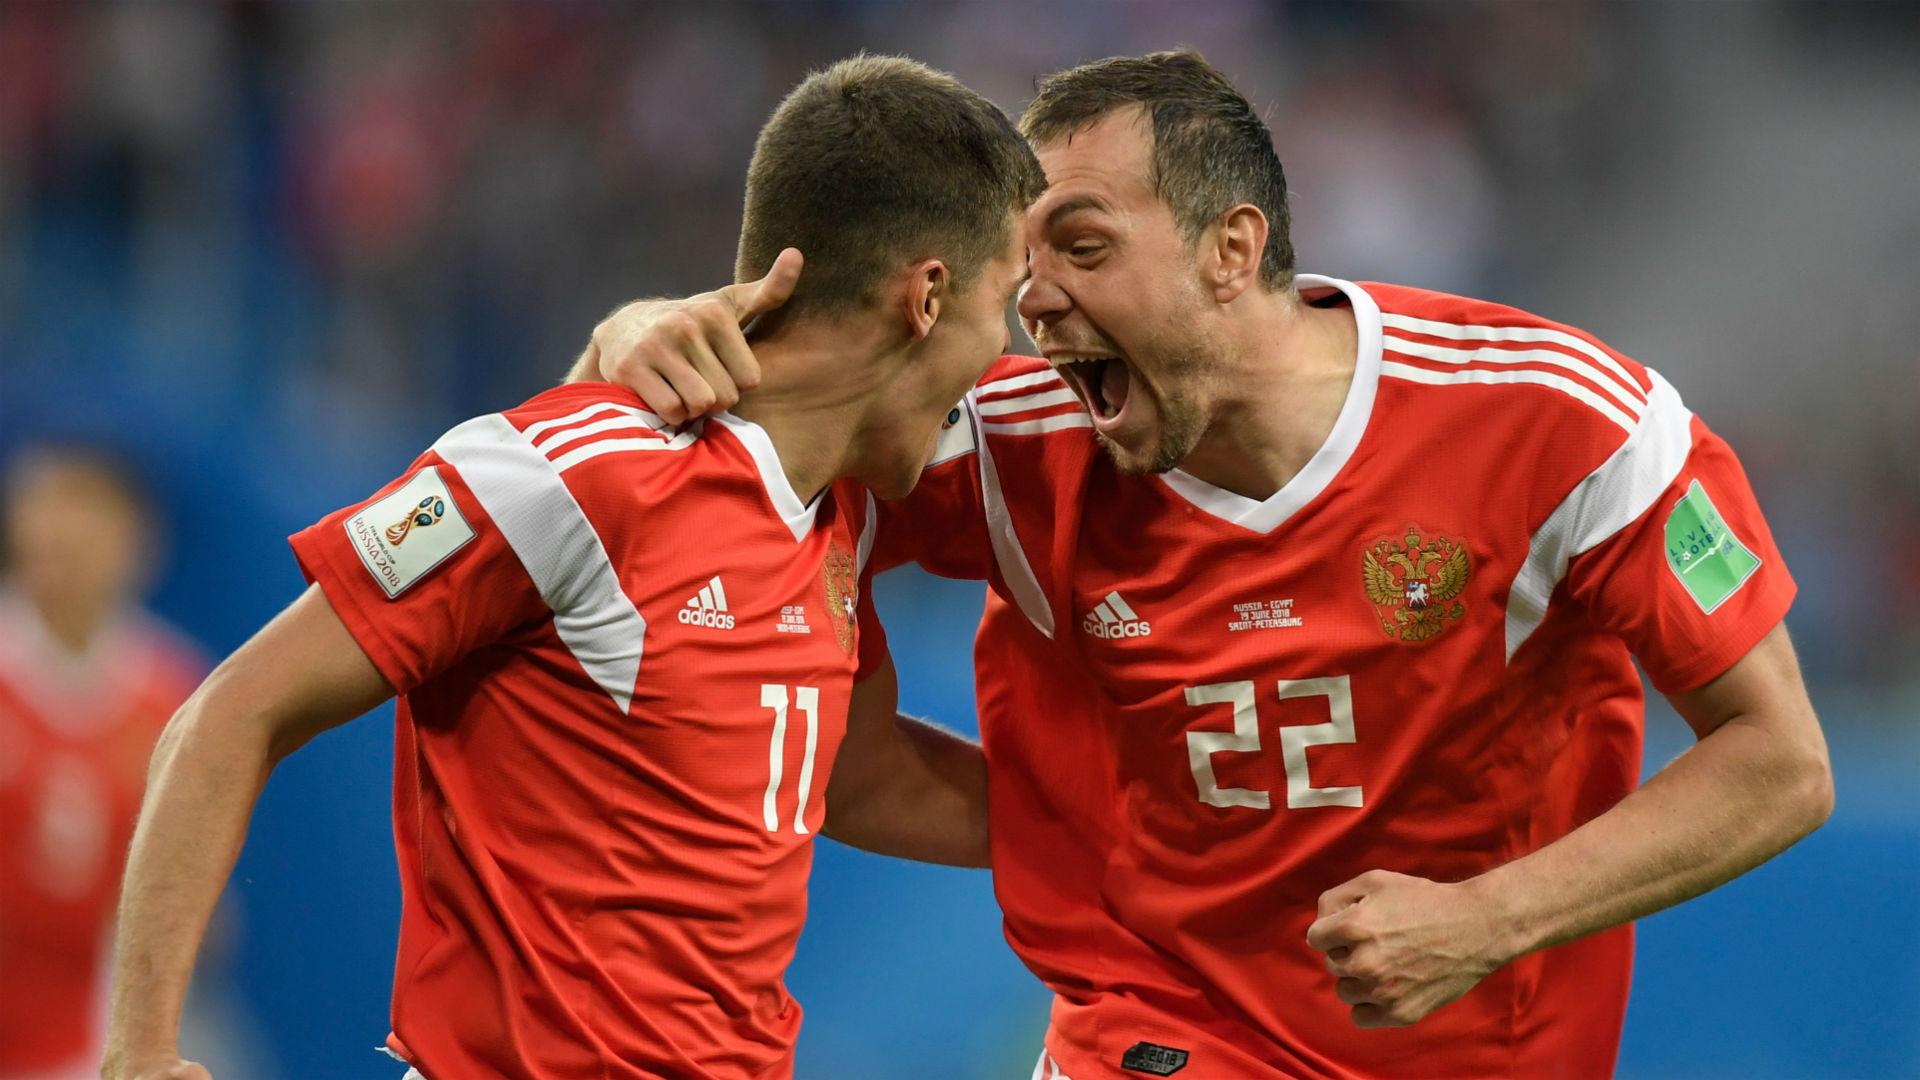 Image result for Artem Dzyuba russia goal gif